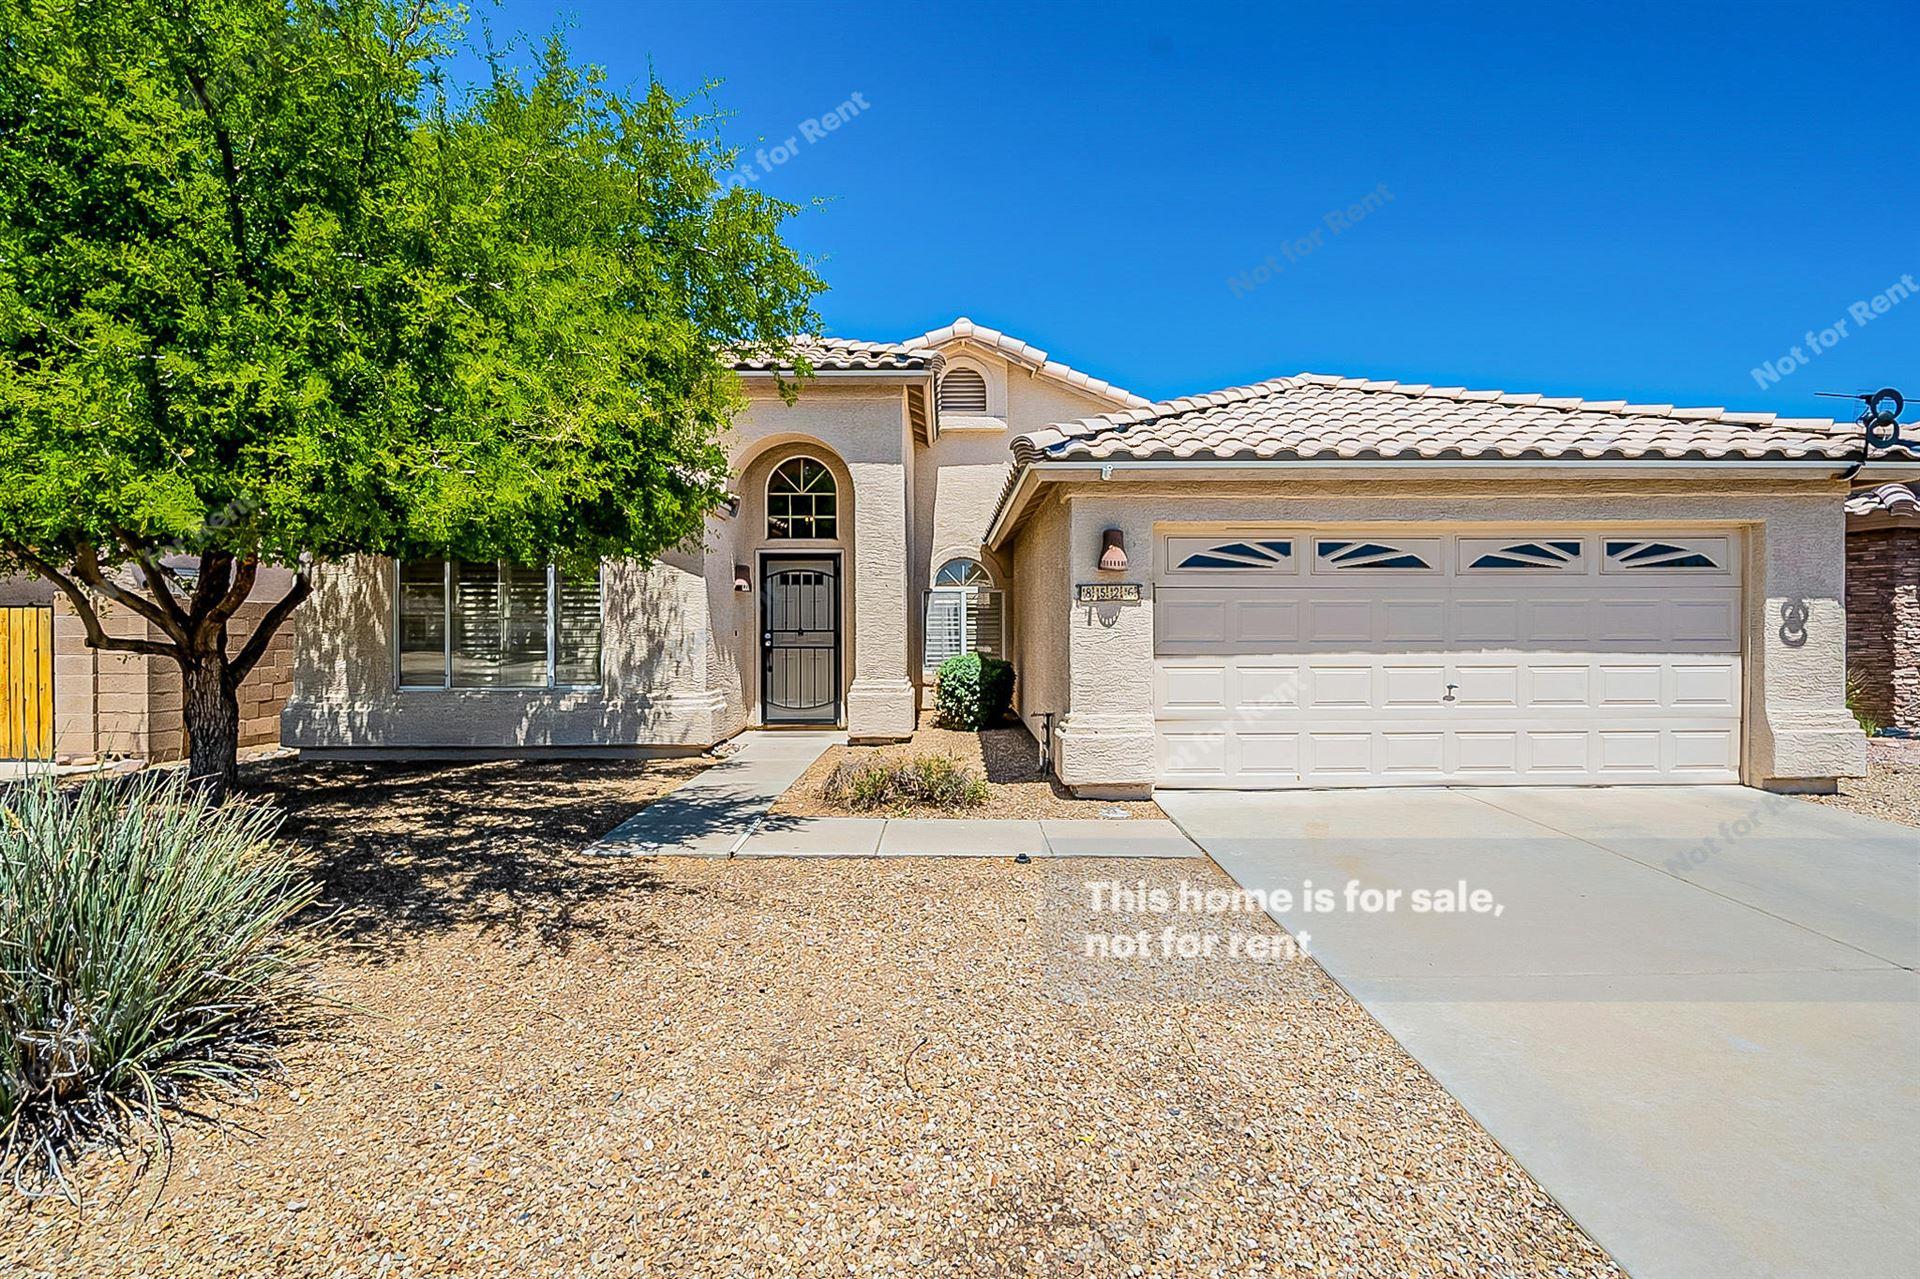 Photo of 8526 W GROVERS Avenue, Peoria, AZ 85382 (MLS # 6232600)